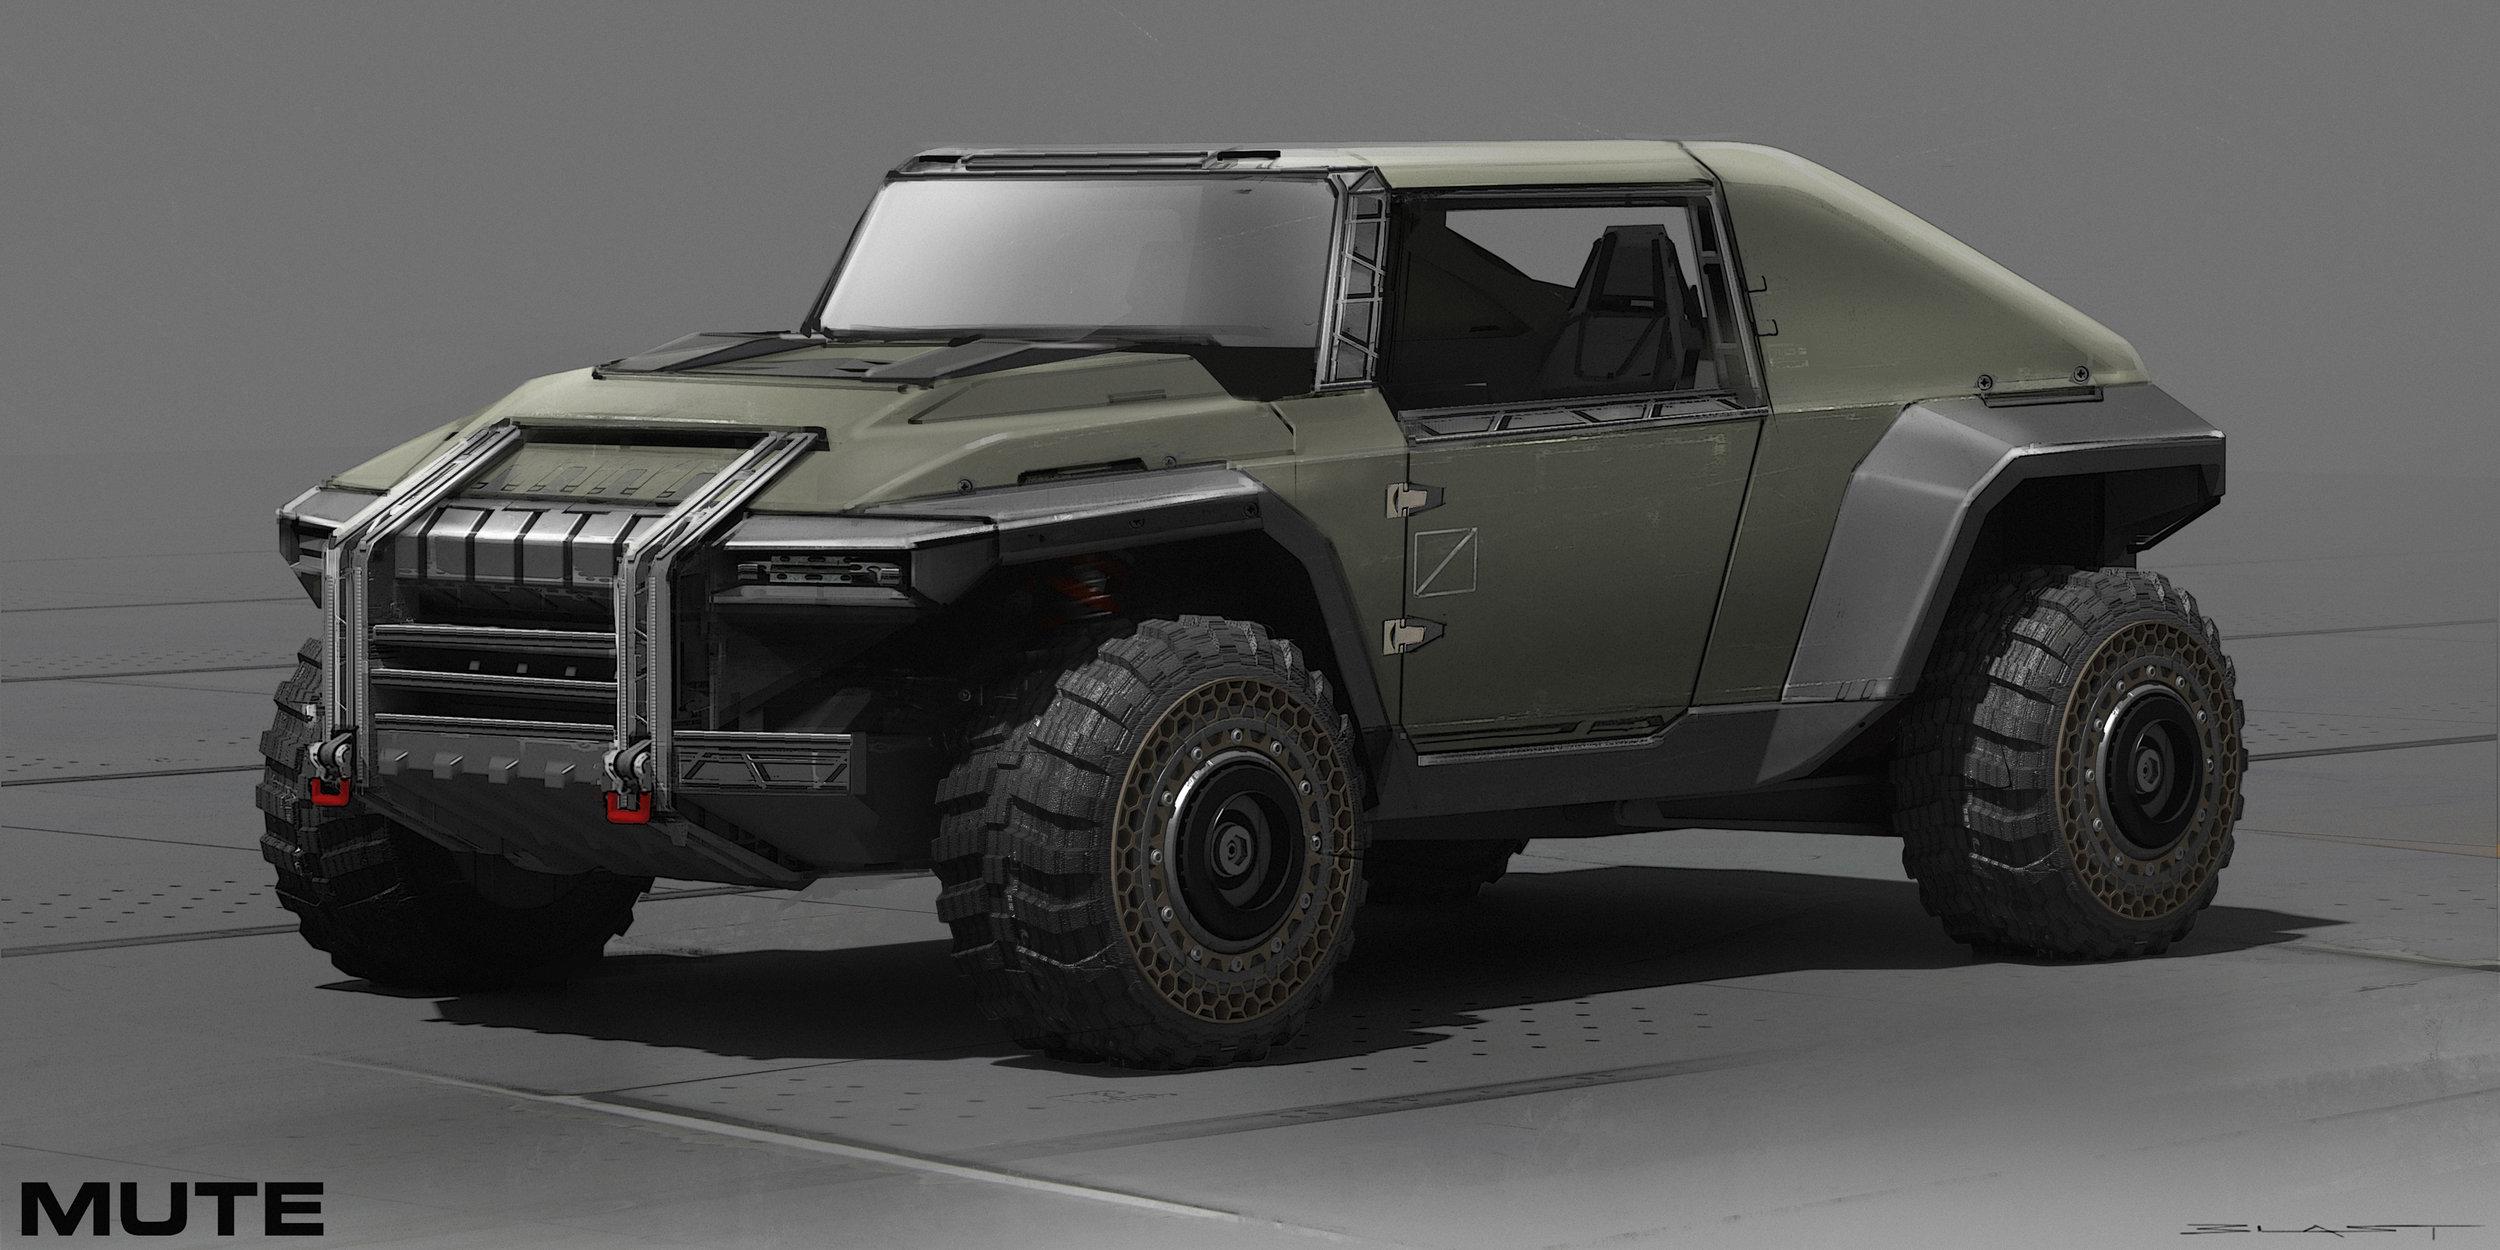 MUTE_jeepfront_milspec_blast.jpg